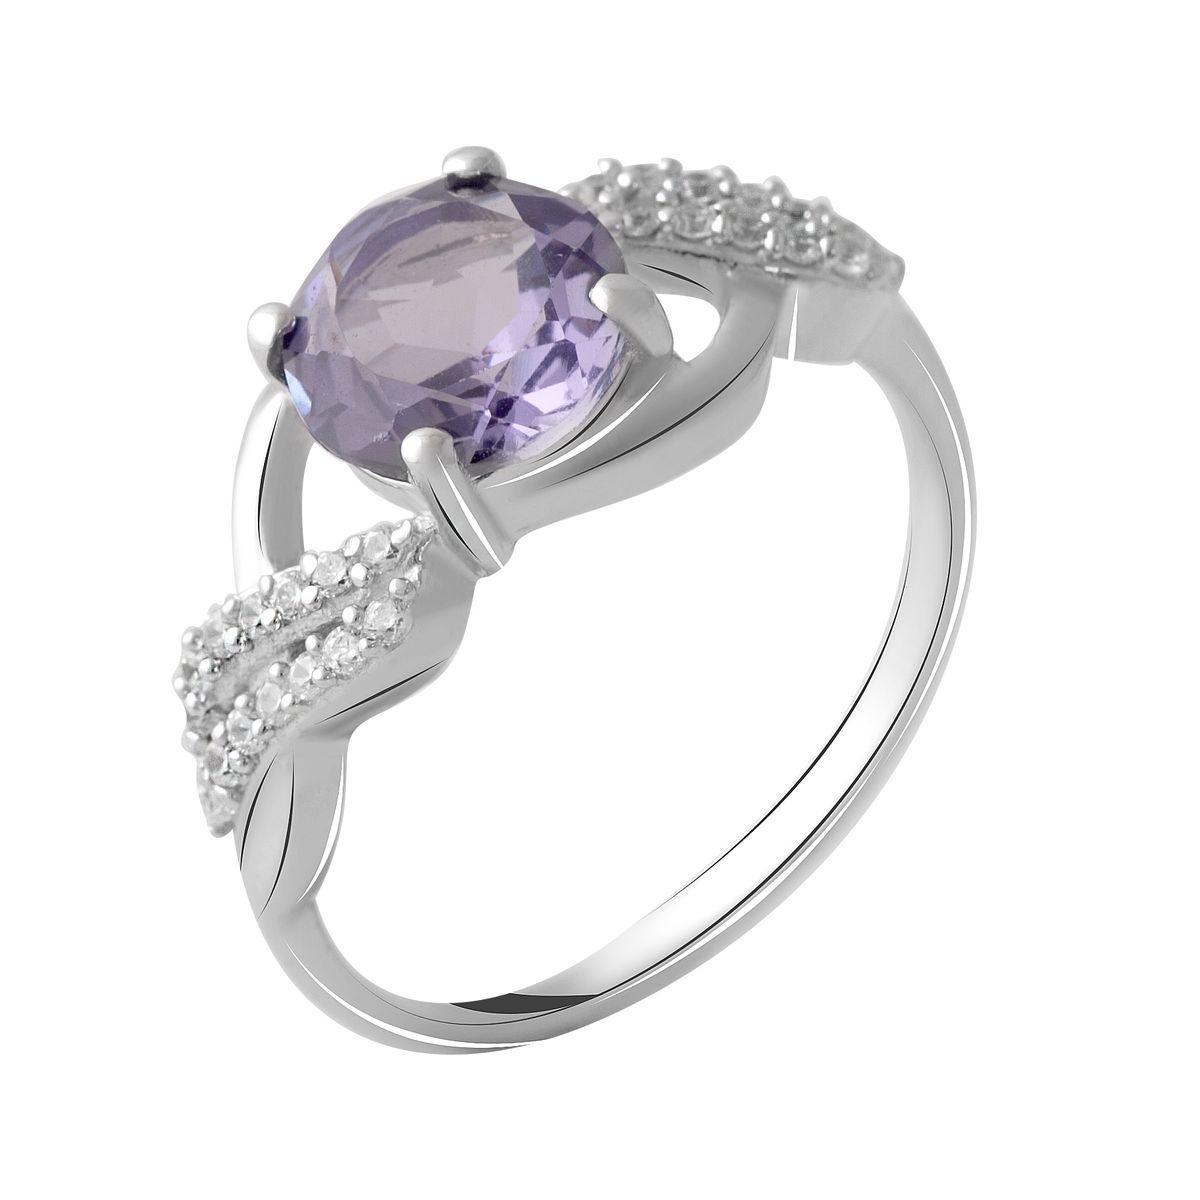 Серебряное кольцо pSilverAlex с олександритом (2050285) 18 размер 2.81, 18.5